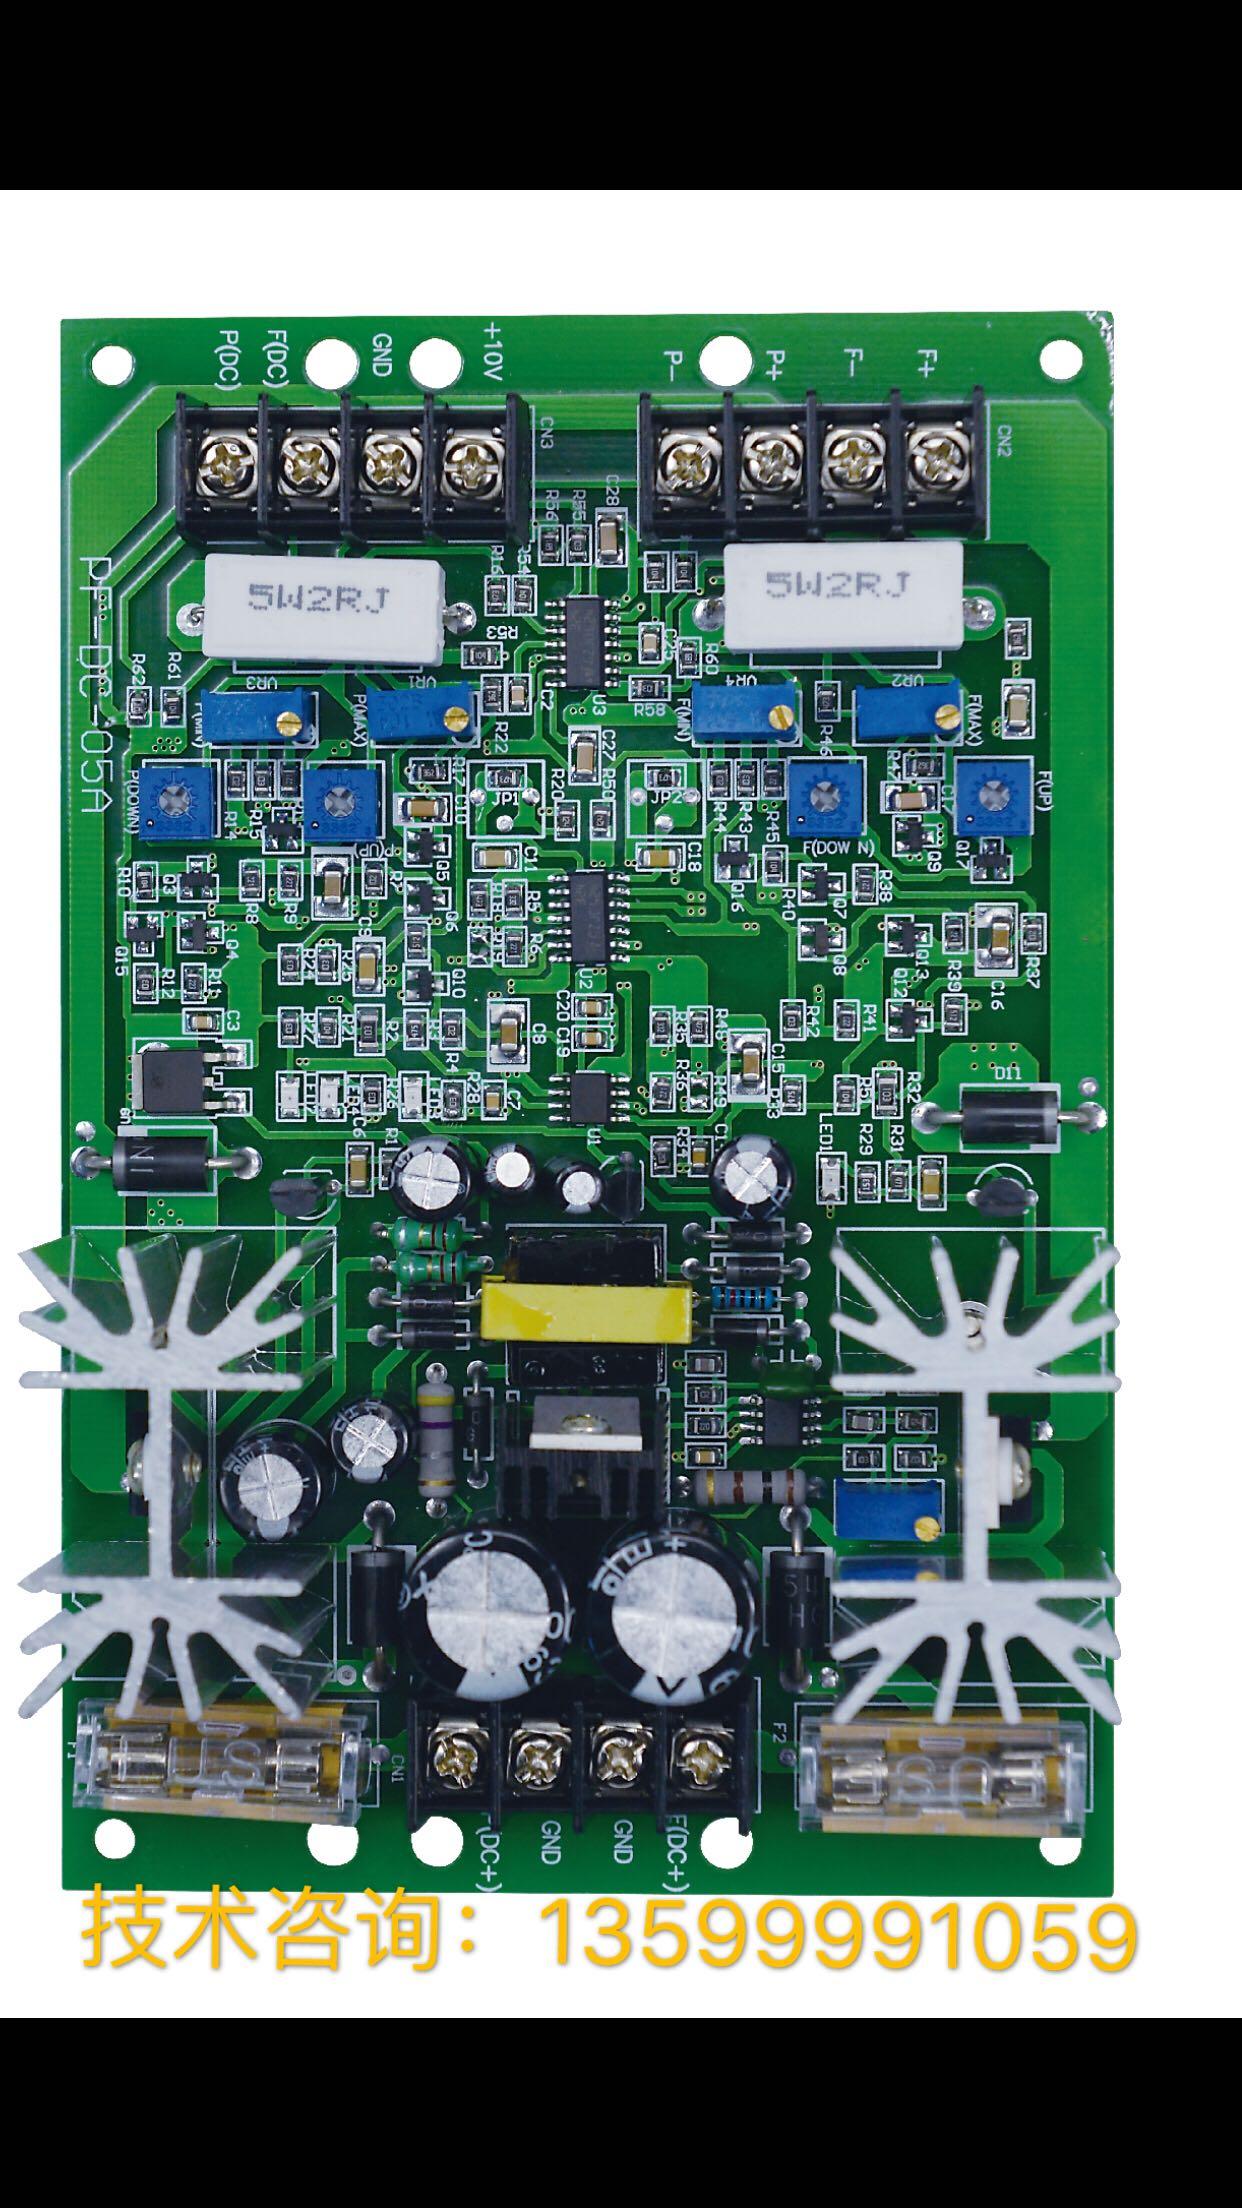 Dual Analog Proportional Valve Amplifier Electromagnetic Proportional Valve Controller KGJD-PF-DCDual Analog Proportional Valve Amplifier Electromagnetic Proportional Valve Controller KGJD-PF-DC